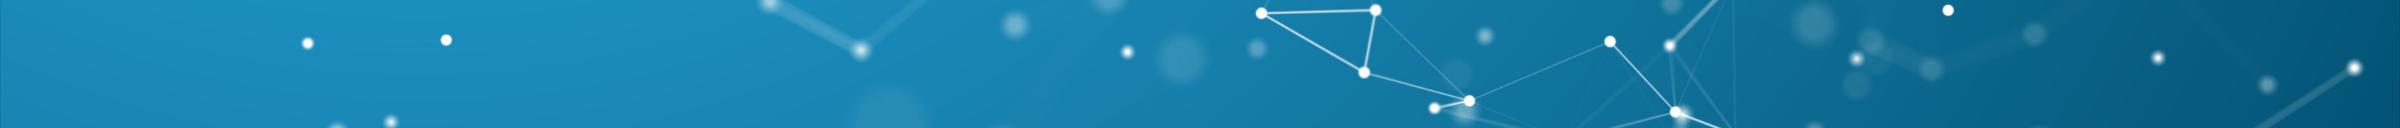 kintone ポータル スペース カバー画像(未来・ネットワーク)